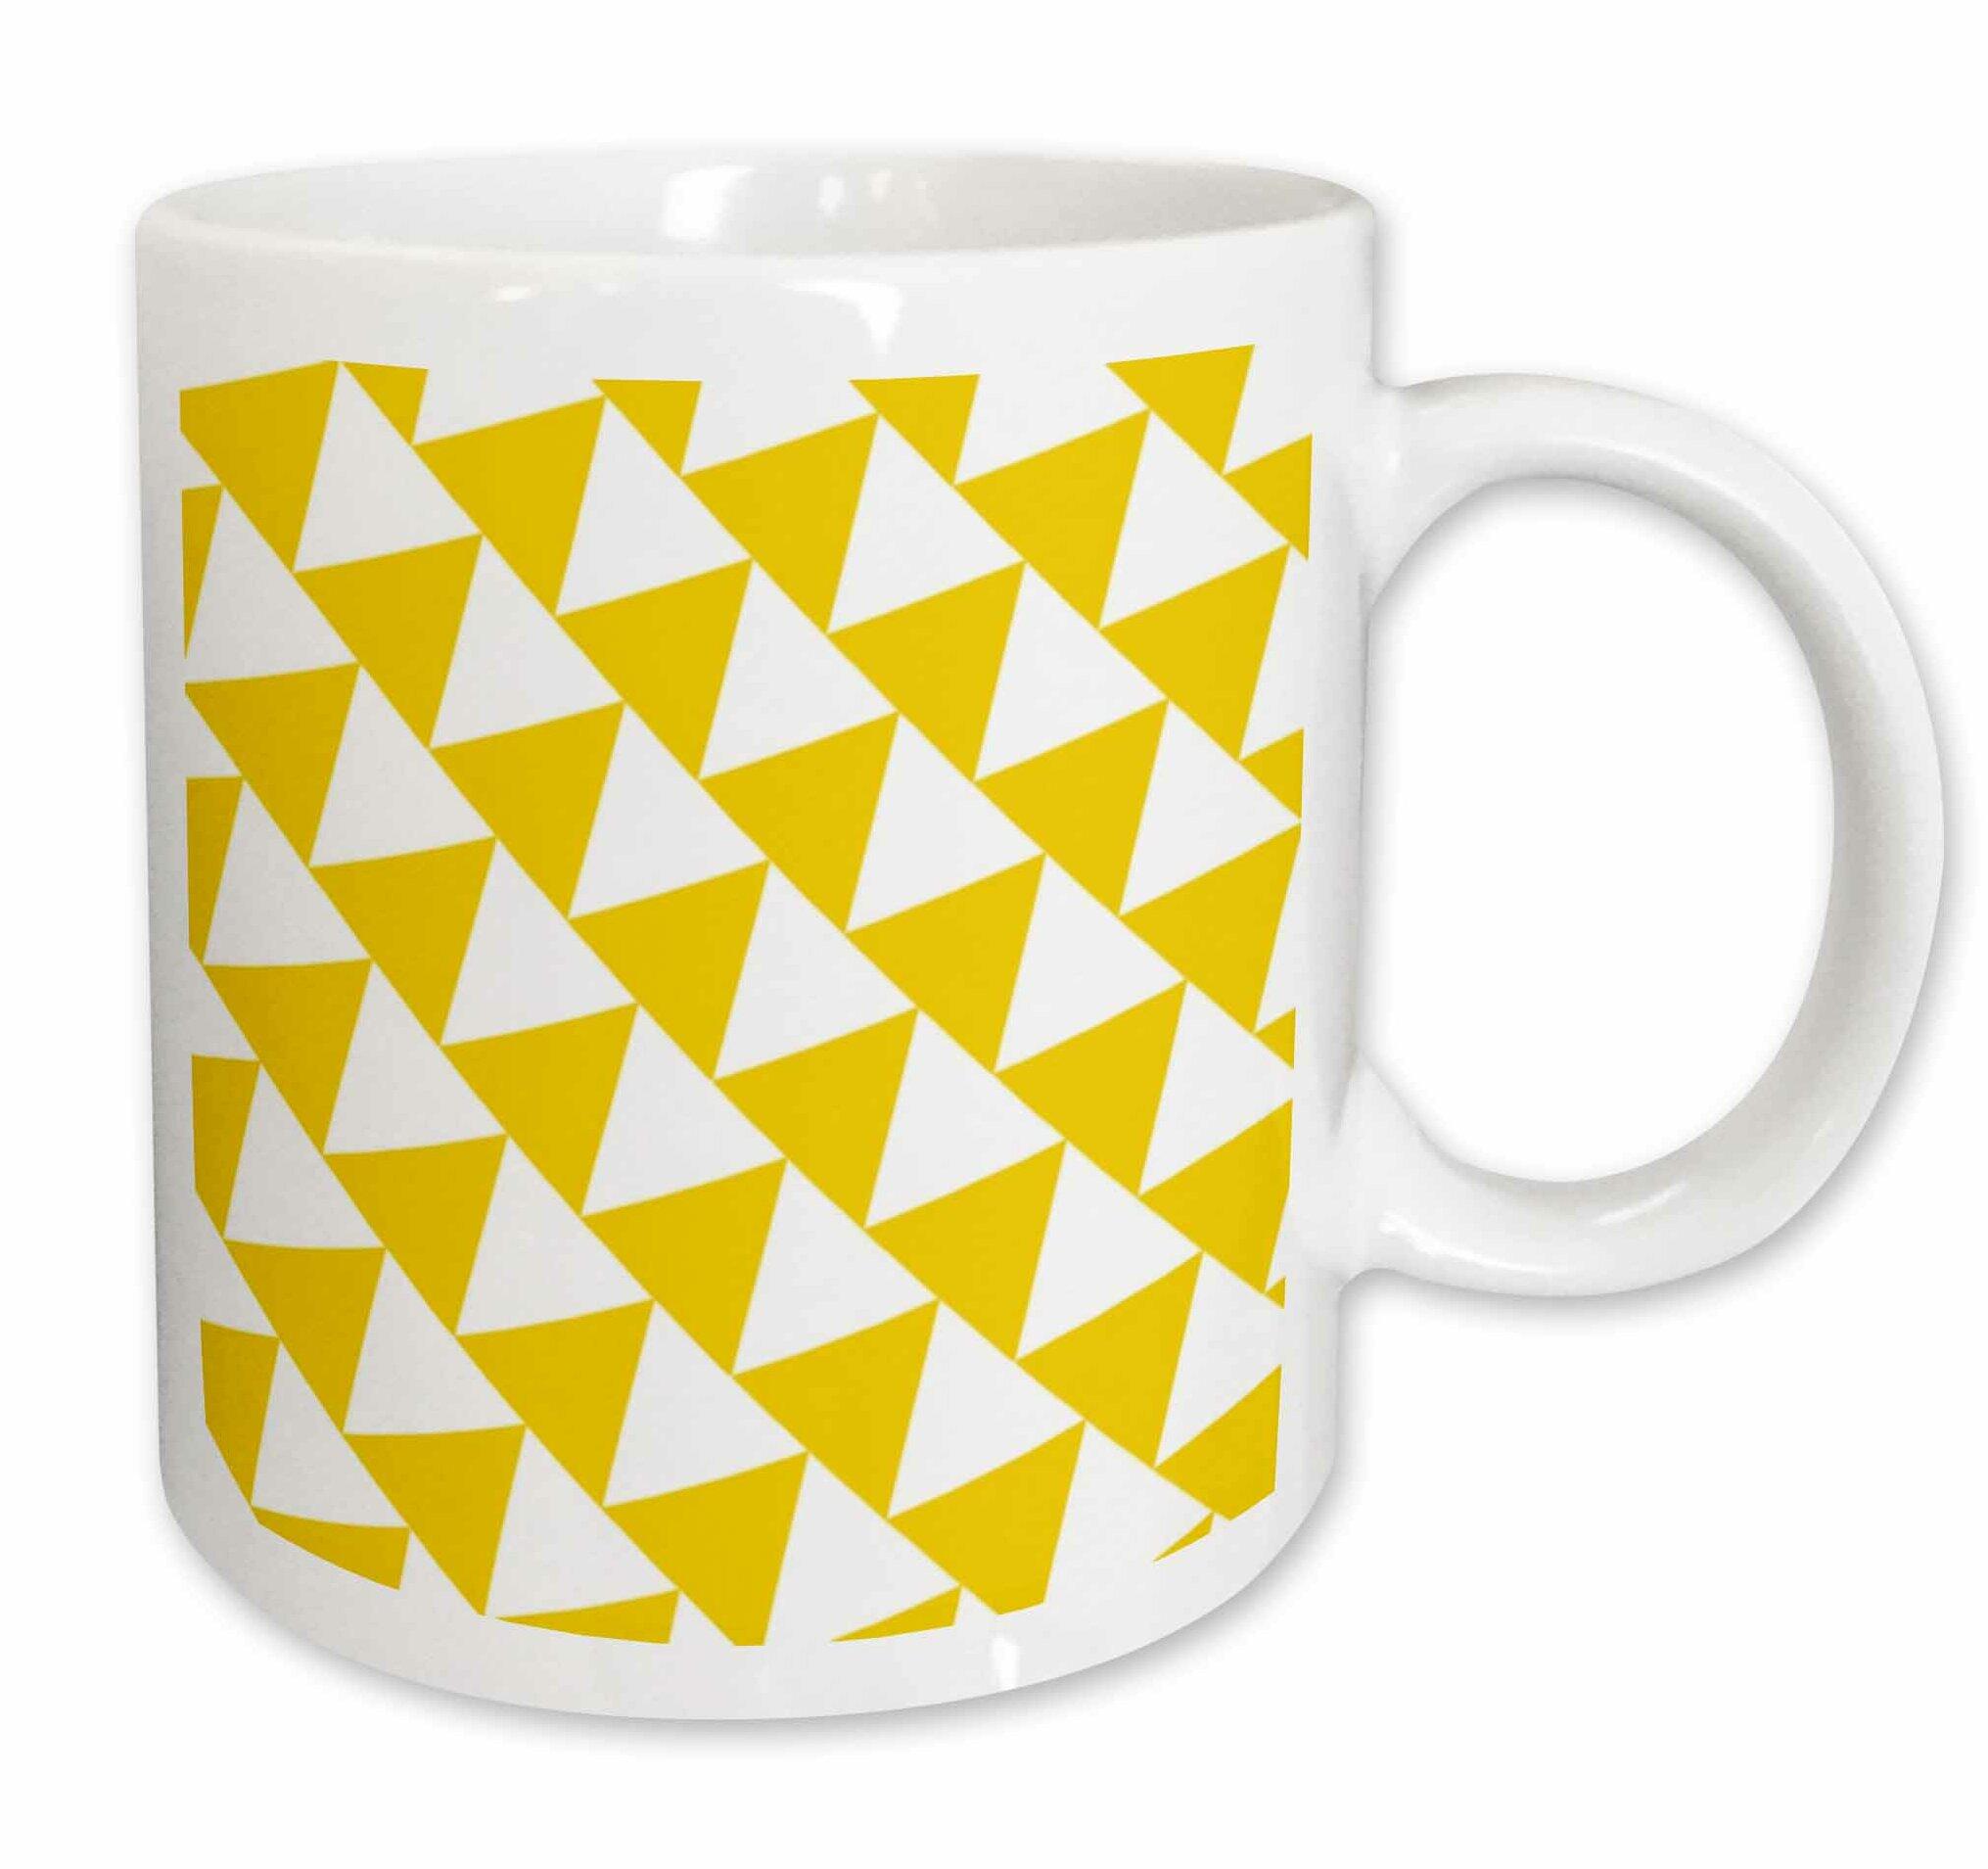 3drose Triangle Pattern Coffee Mug Wayfair